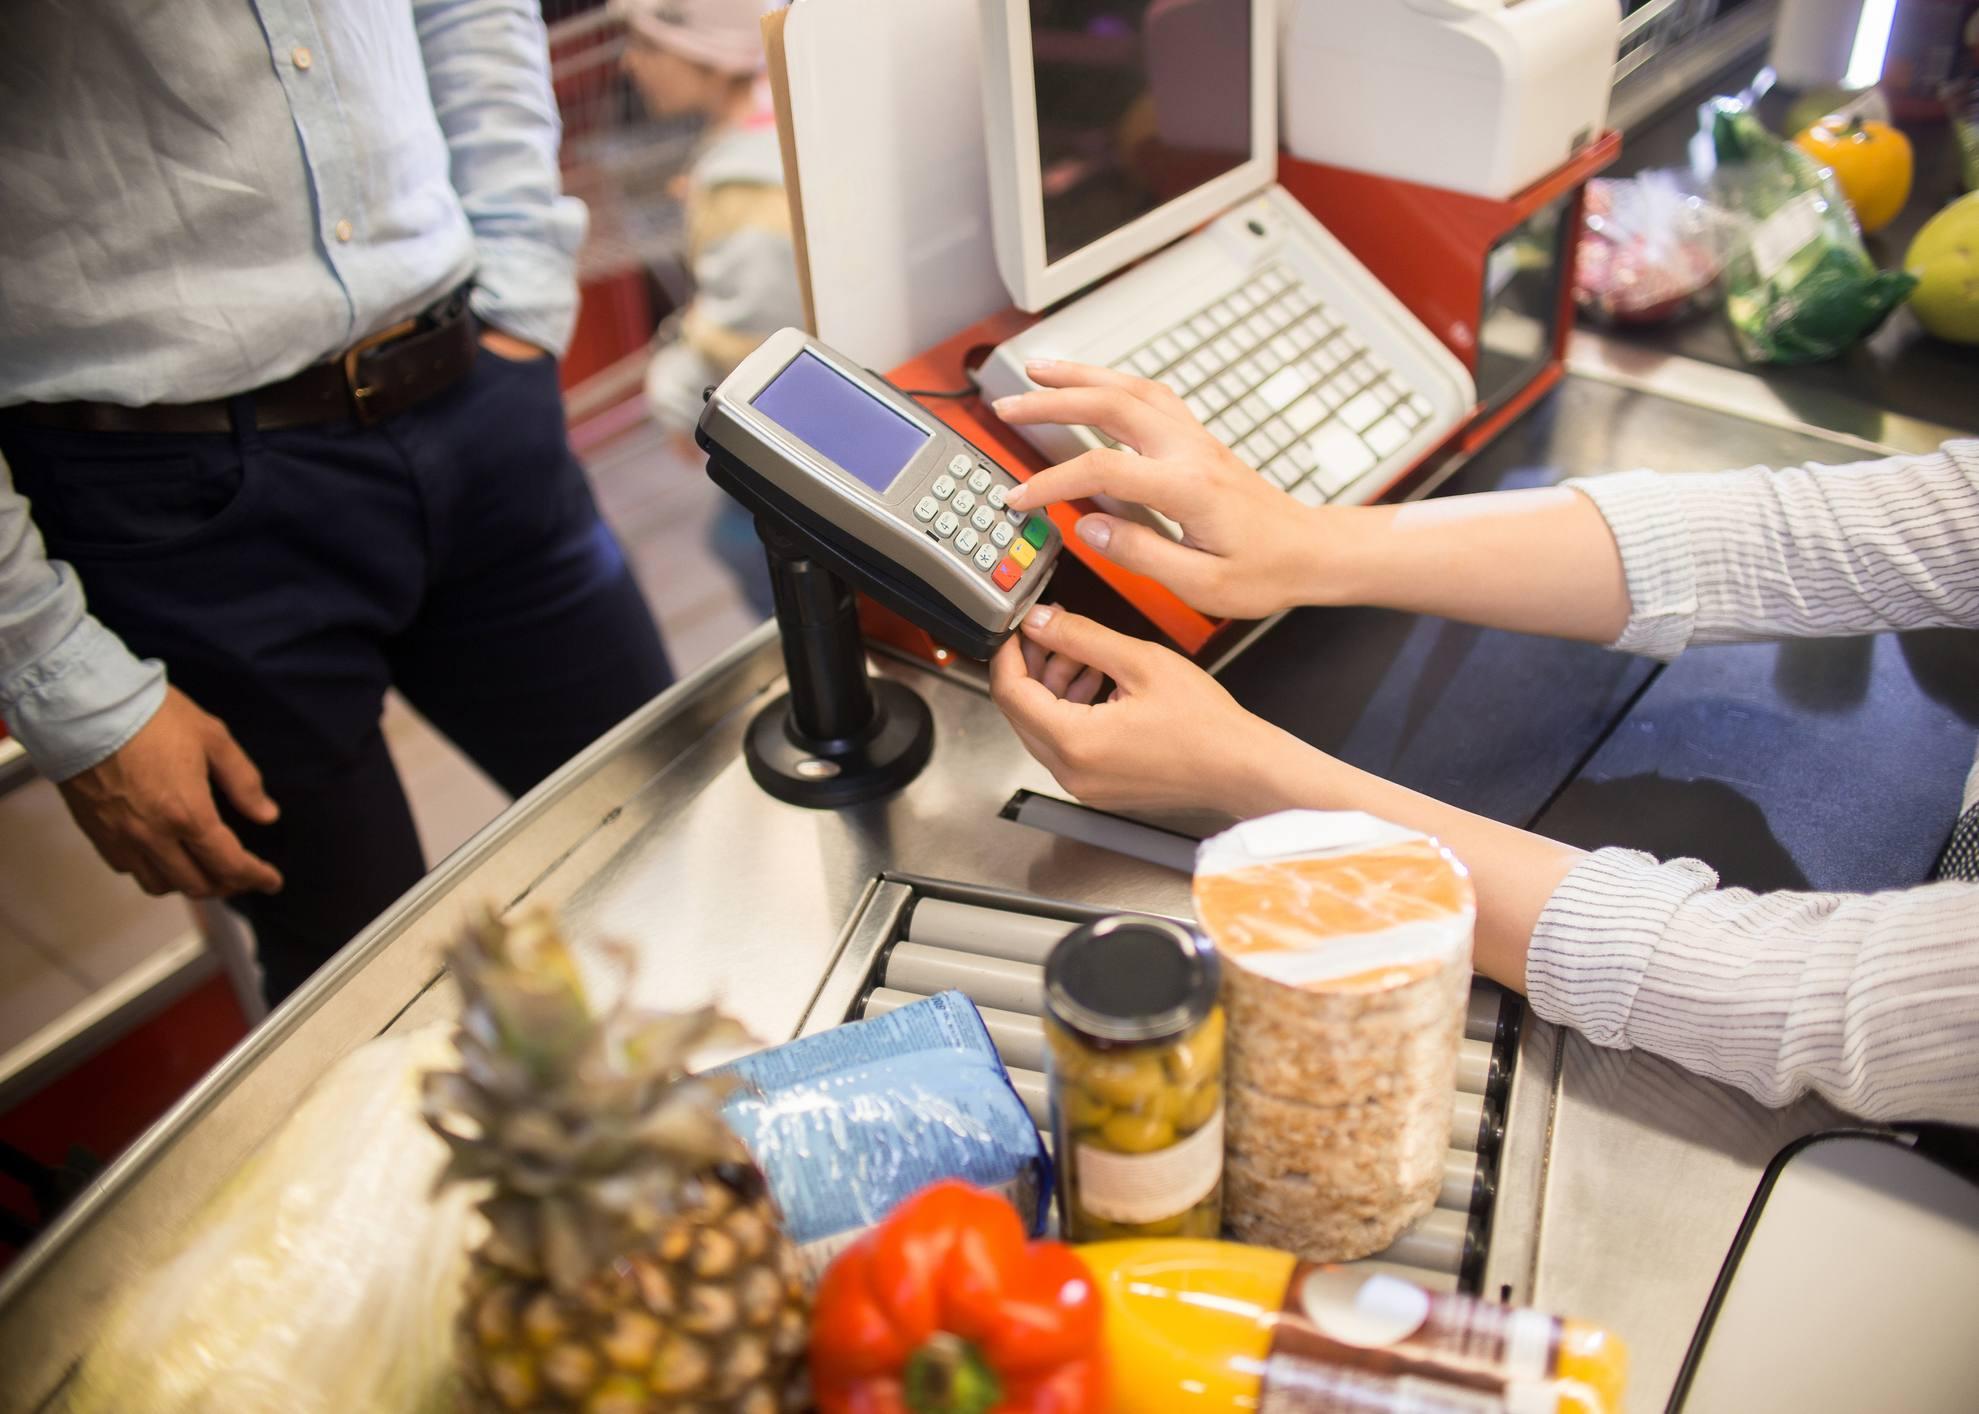 terminal de pagamento automático